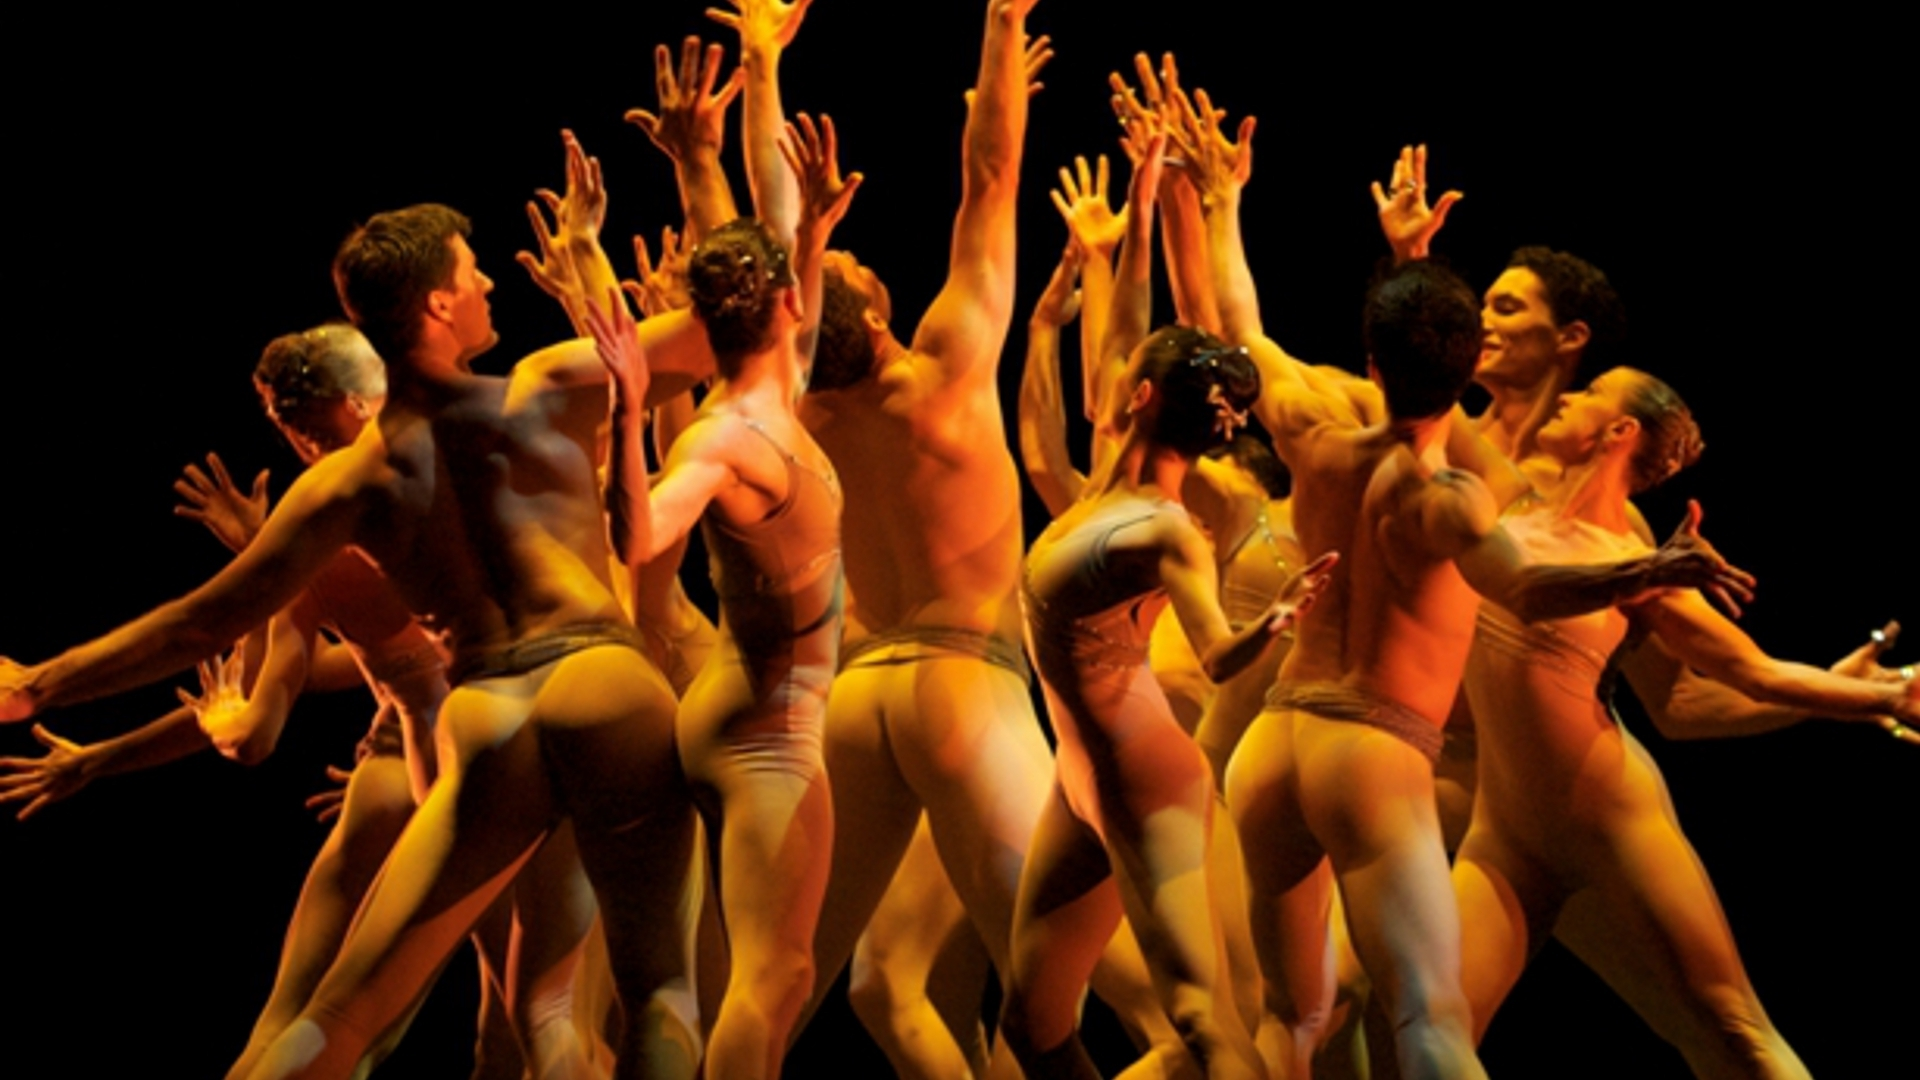 Naked dance group image